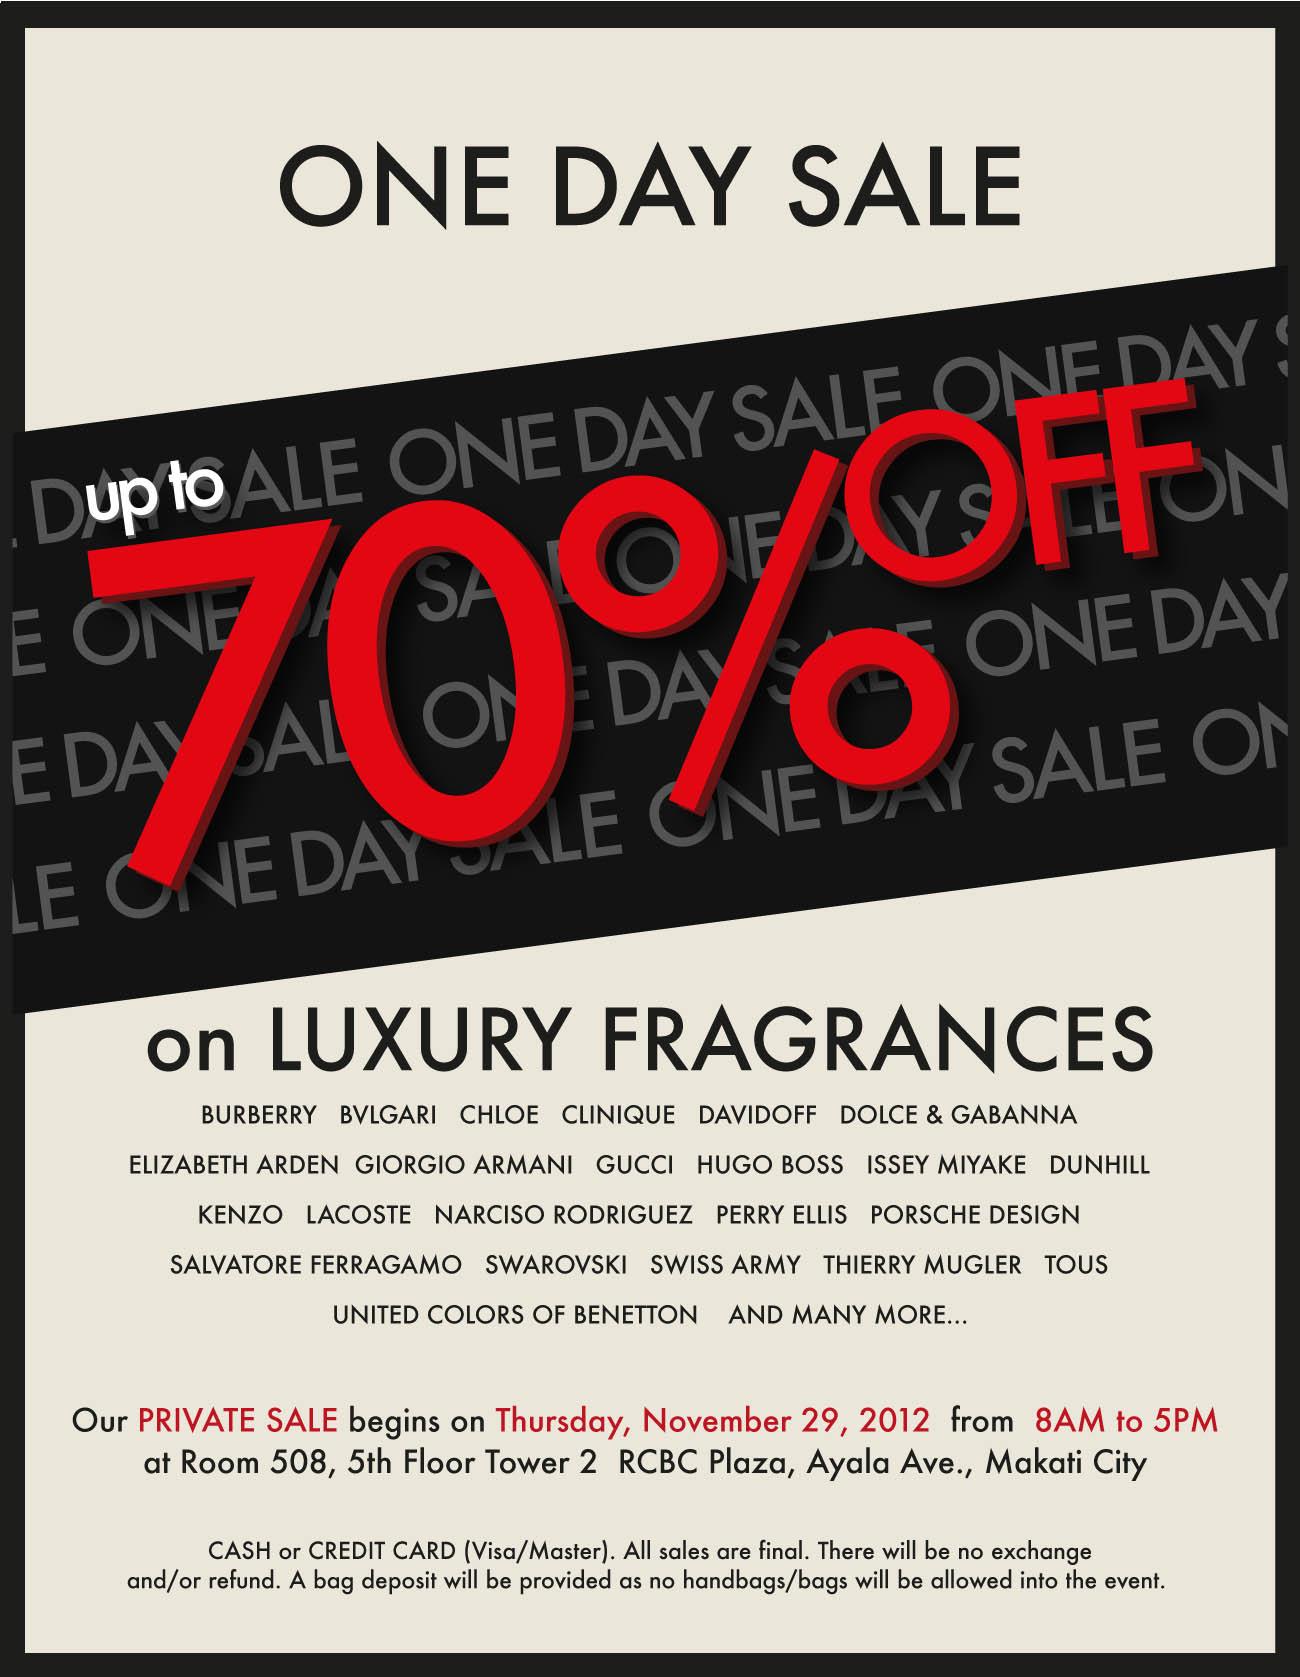 Luxury Fragrance Private Sale @ RCBC Plaza November 2012